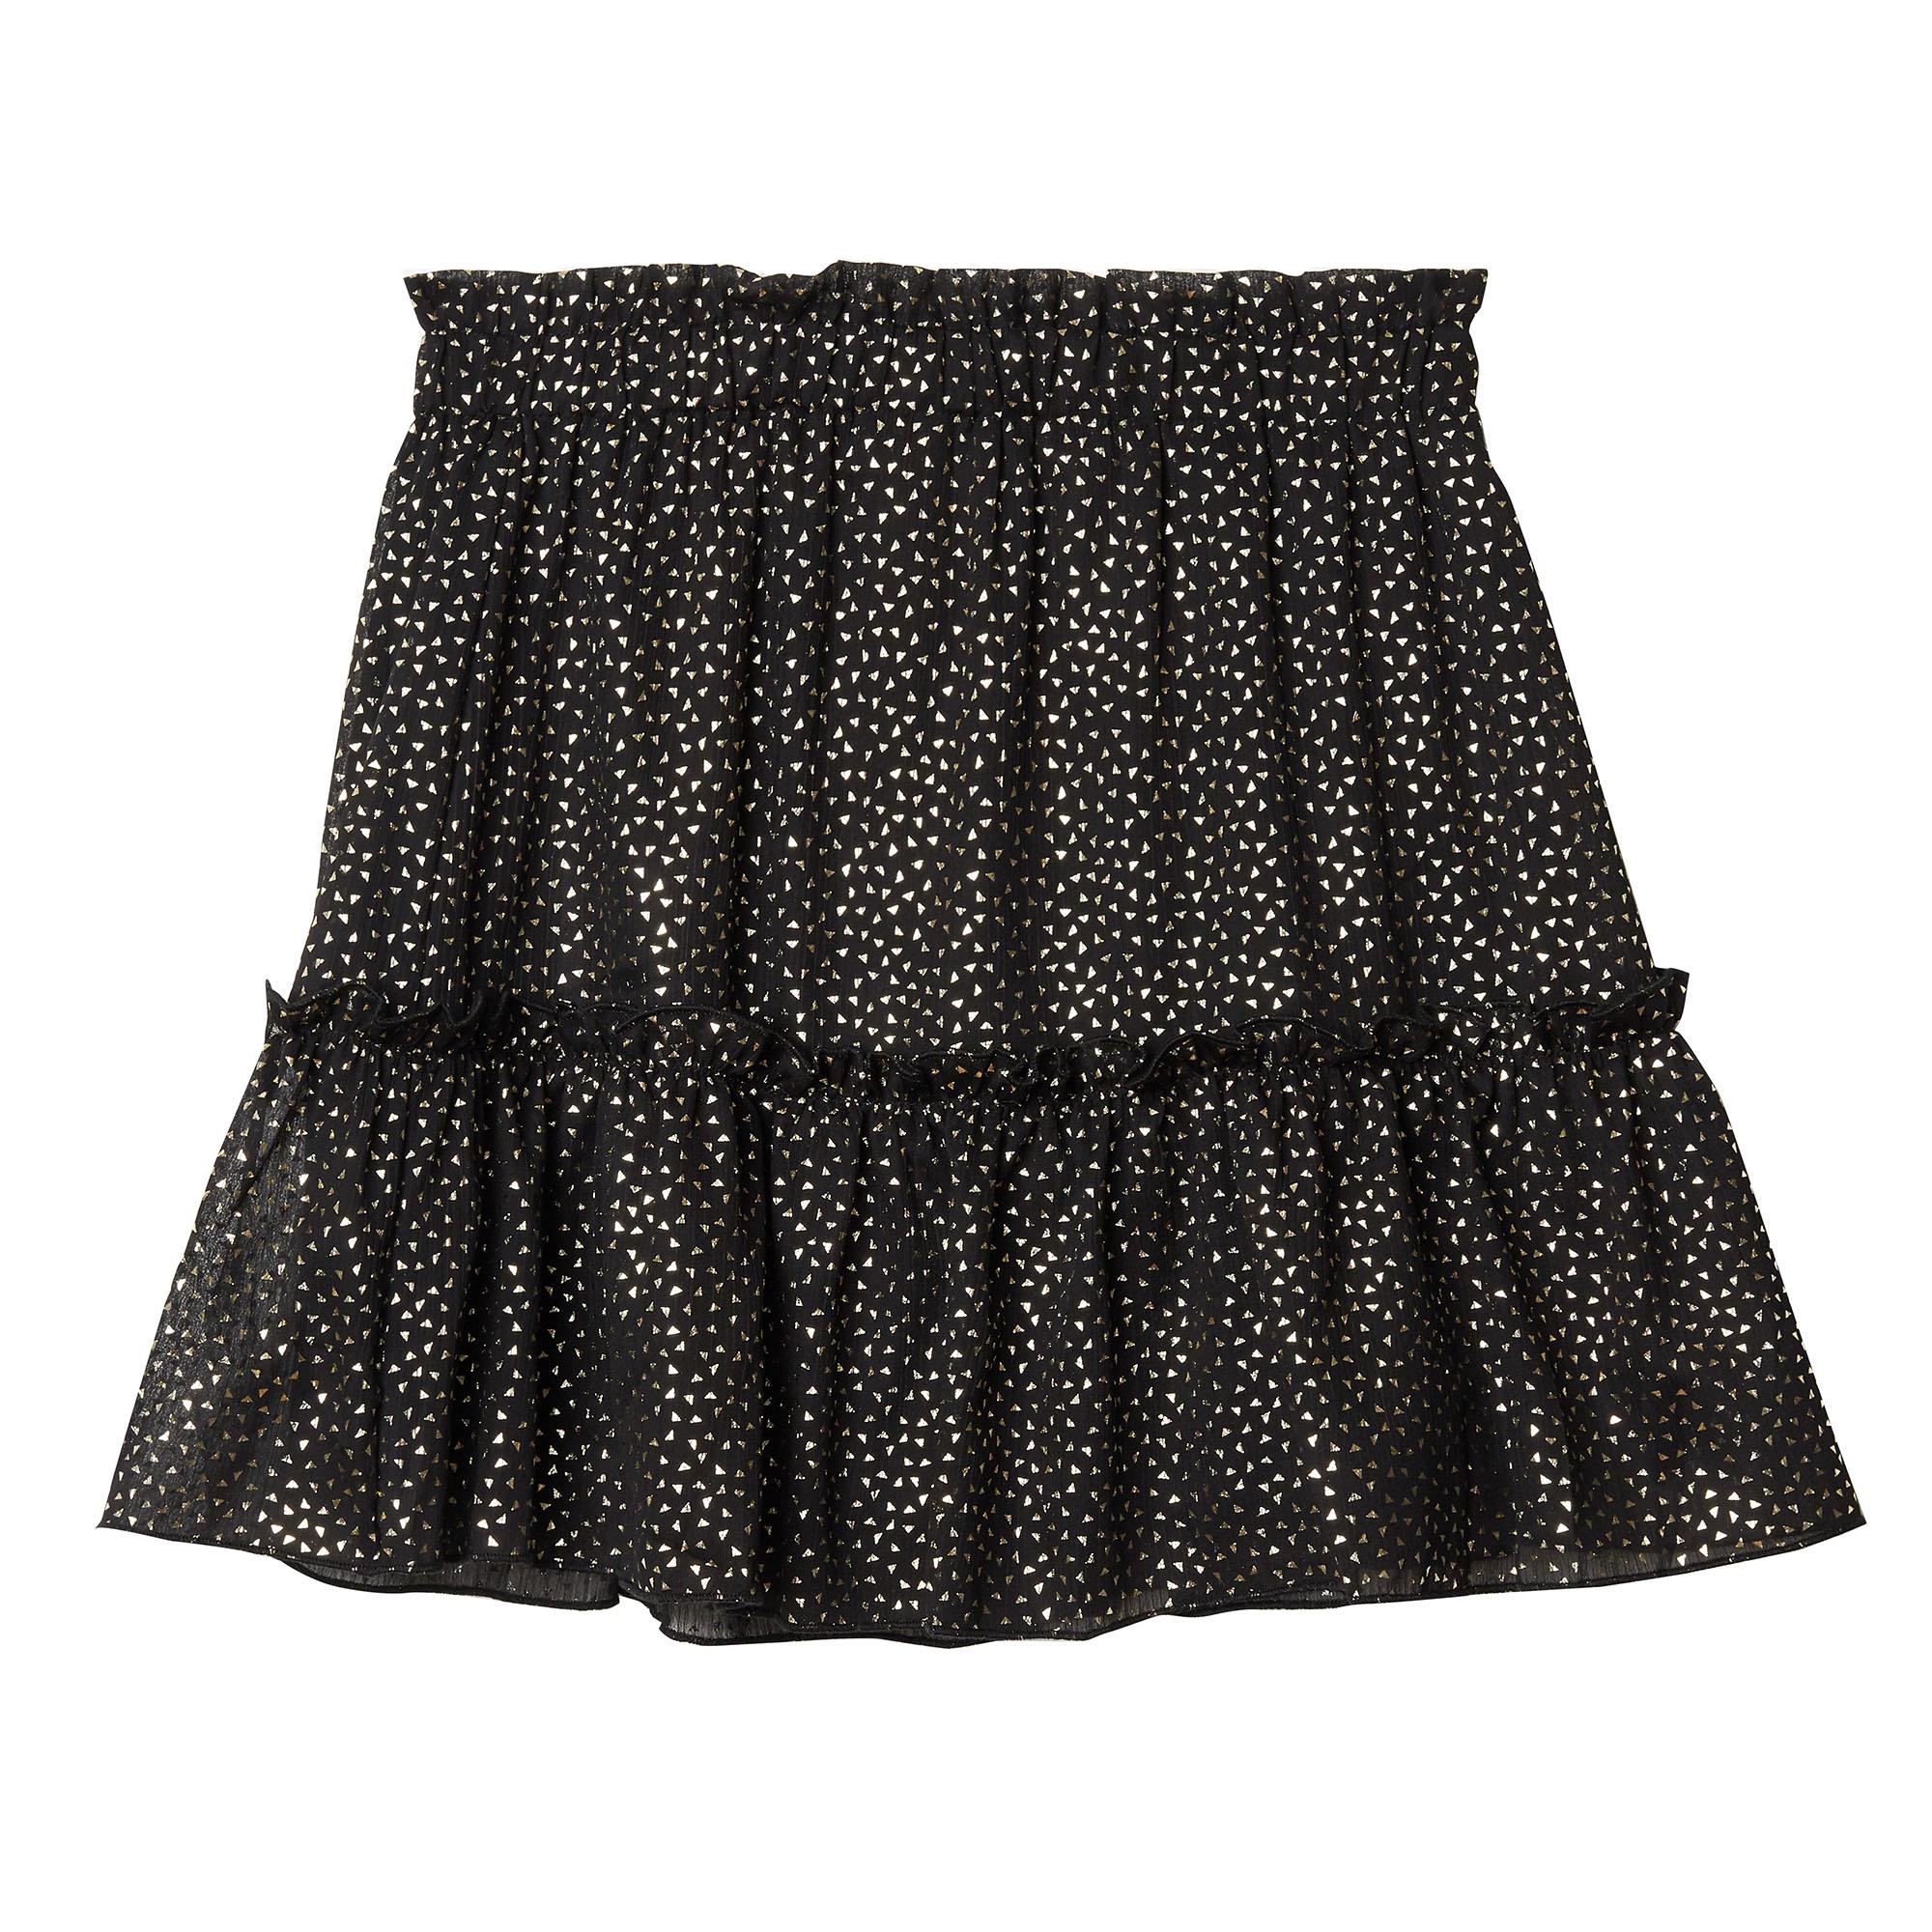 YW Tina Triangle Skirt Black